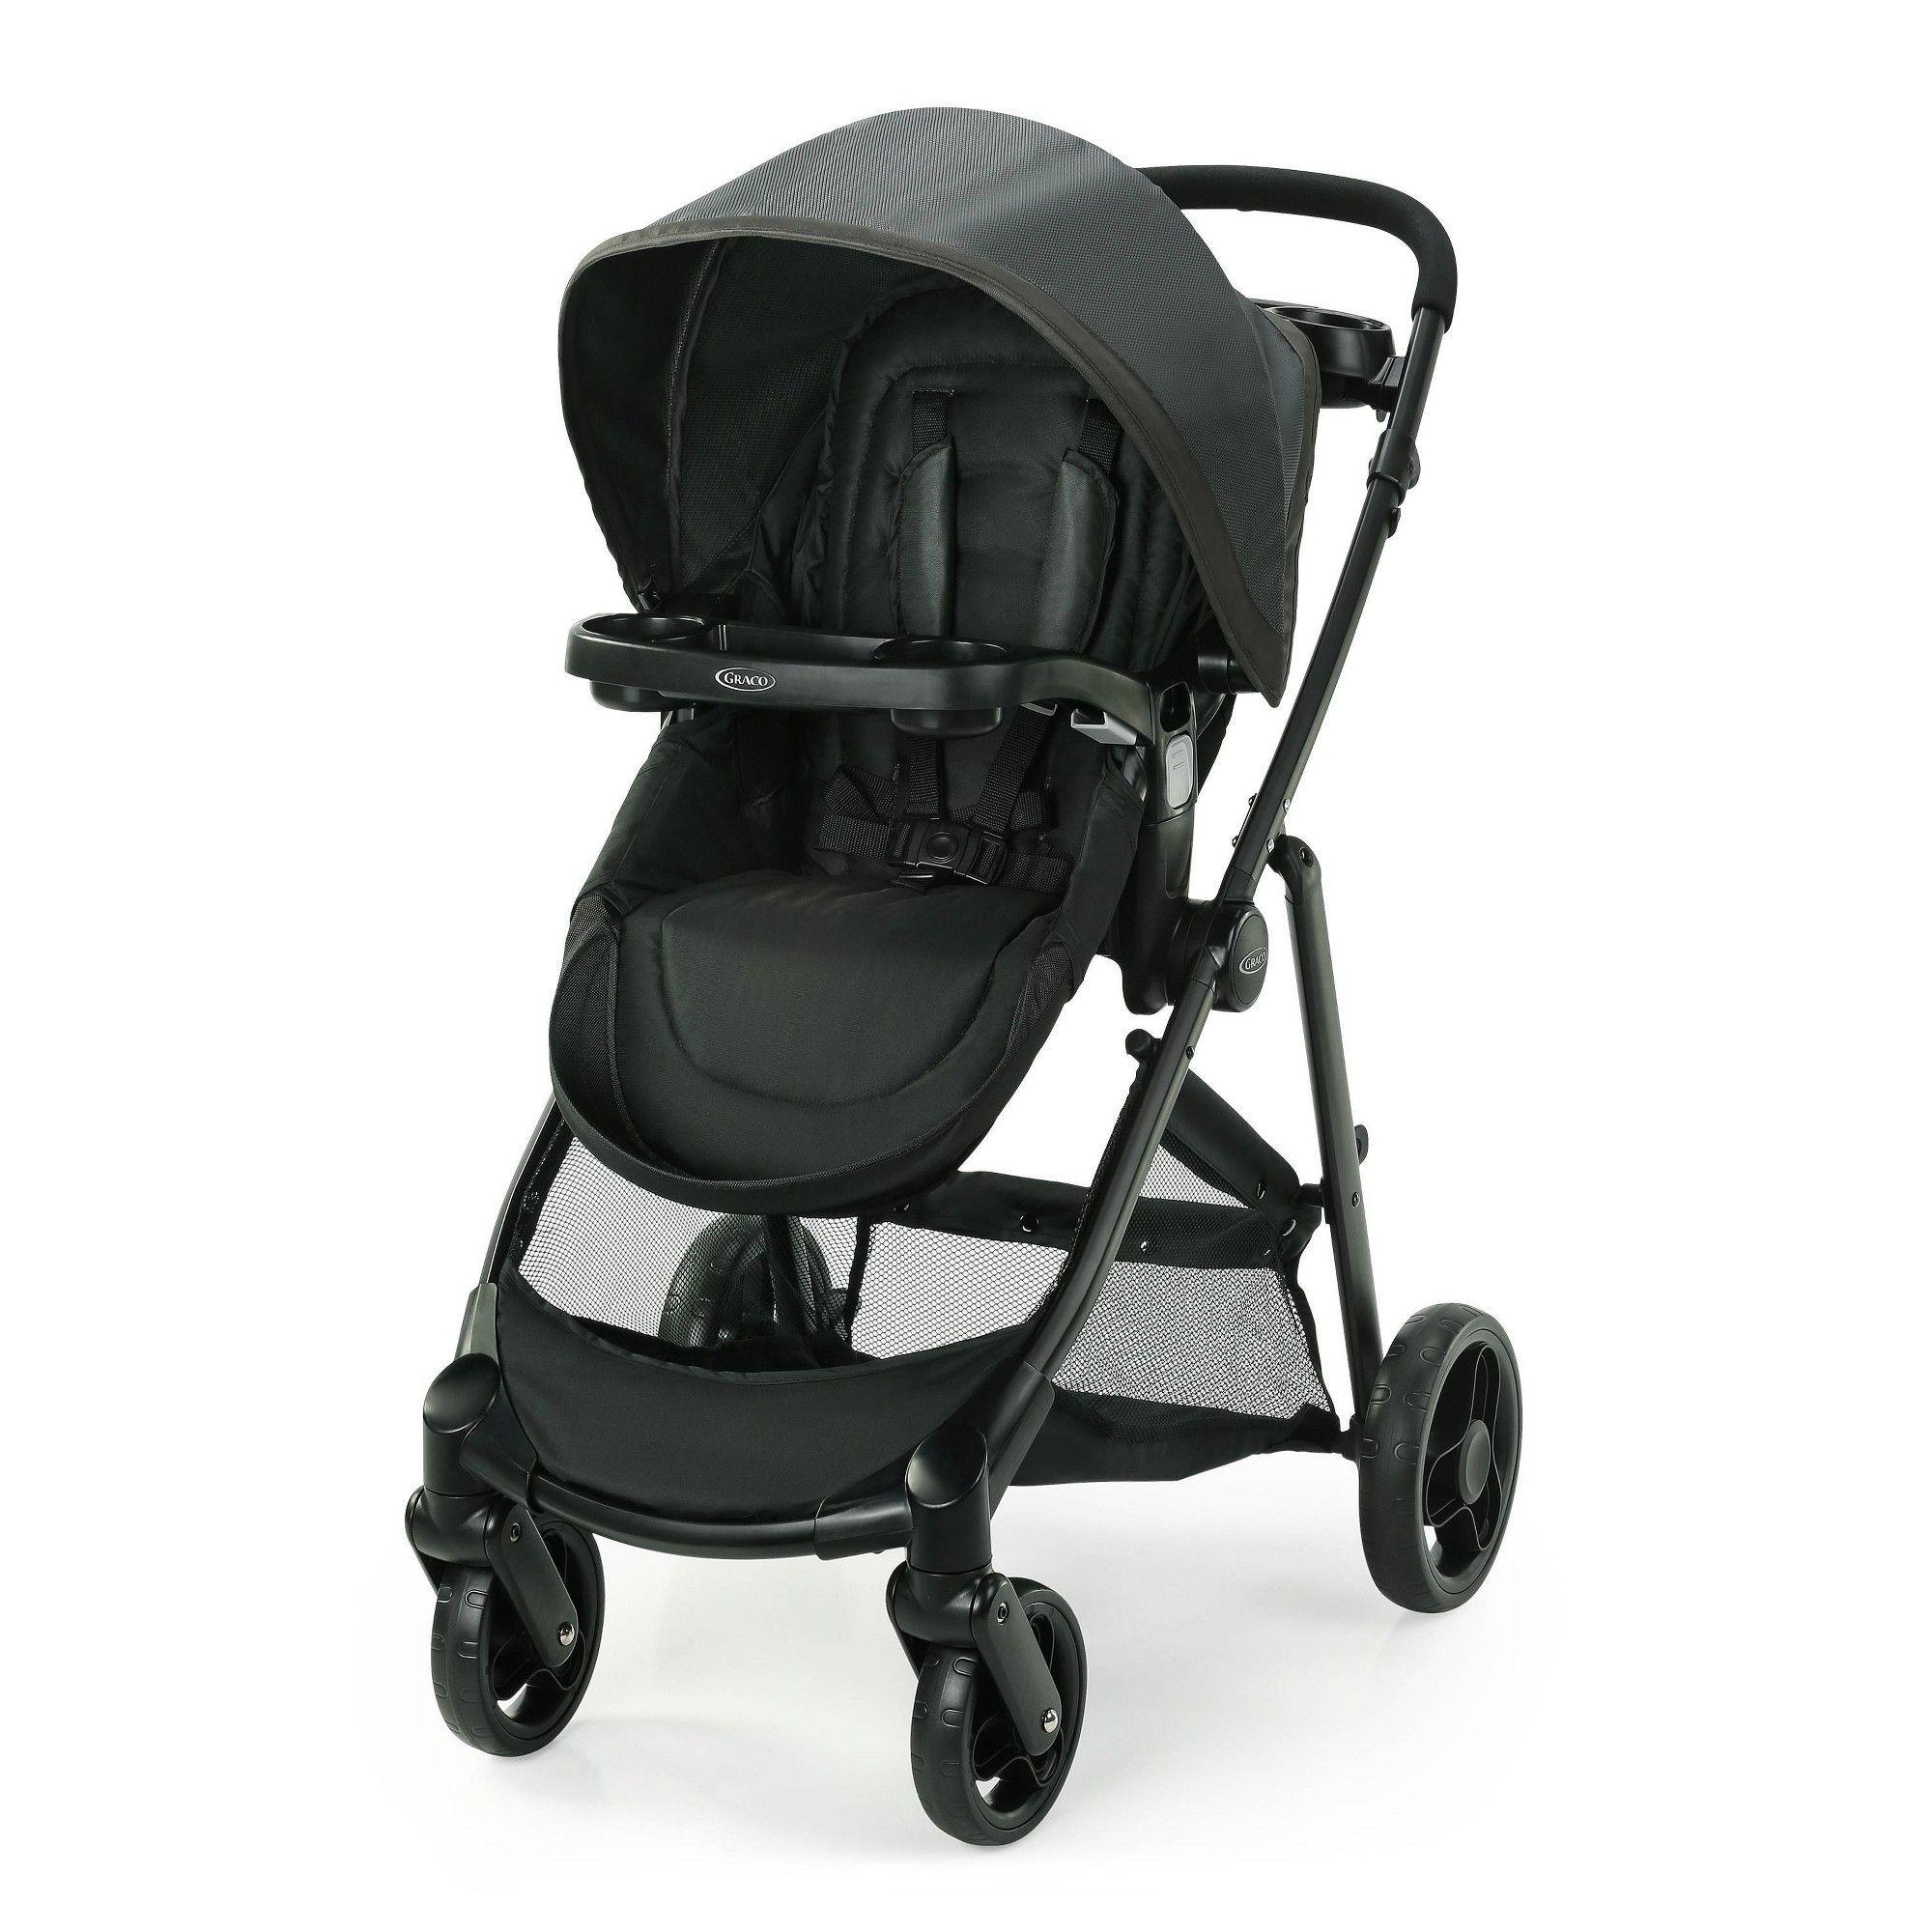 Graco Modes Element Stroller Gotham Baby Strollers Stroller Graco Modes Click Connect Stroller